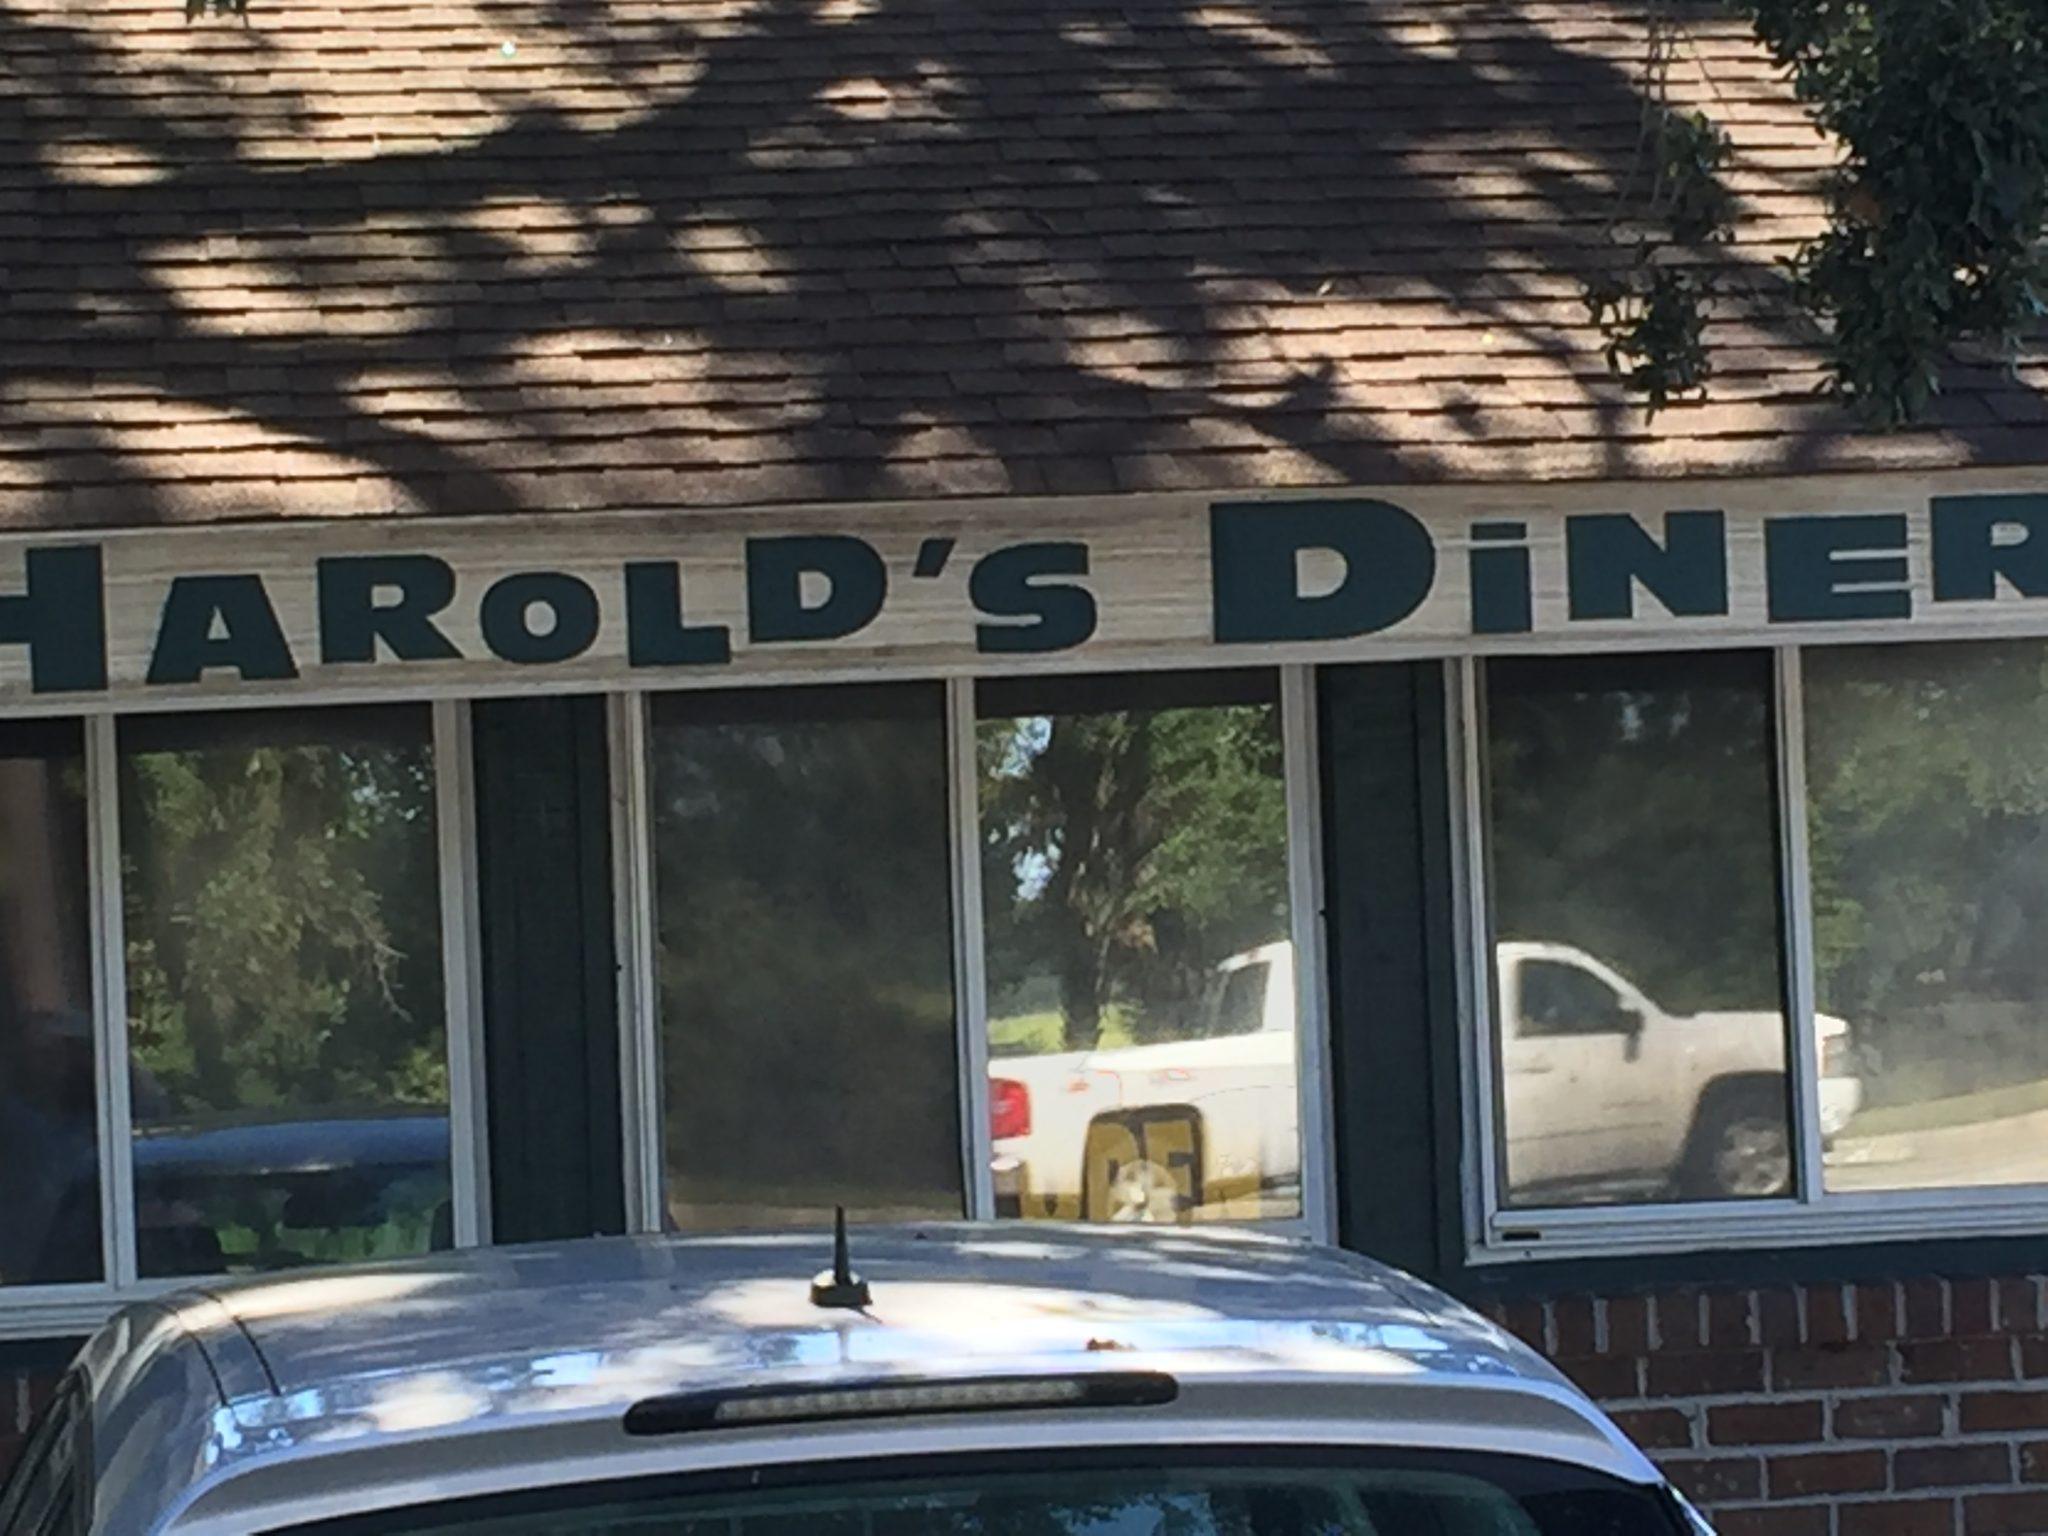 Harold's Diner – Hilton Head Island, South Carolina